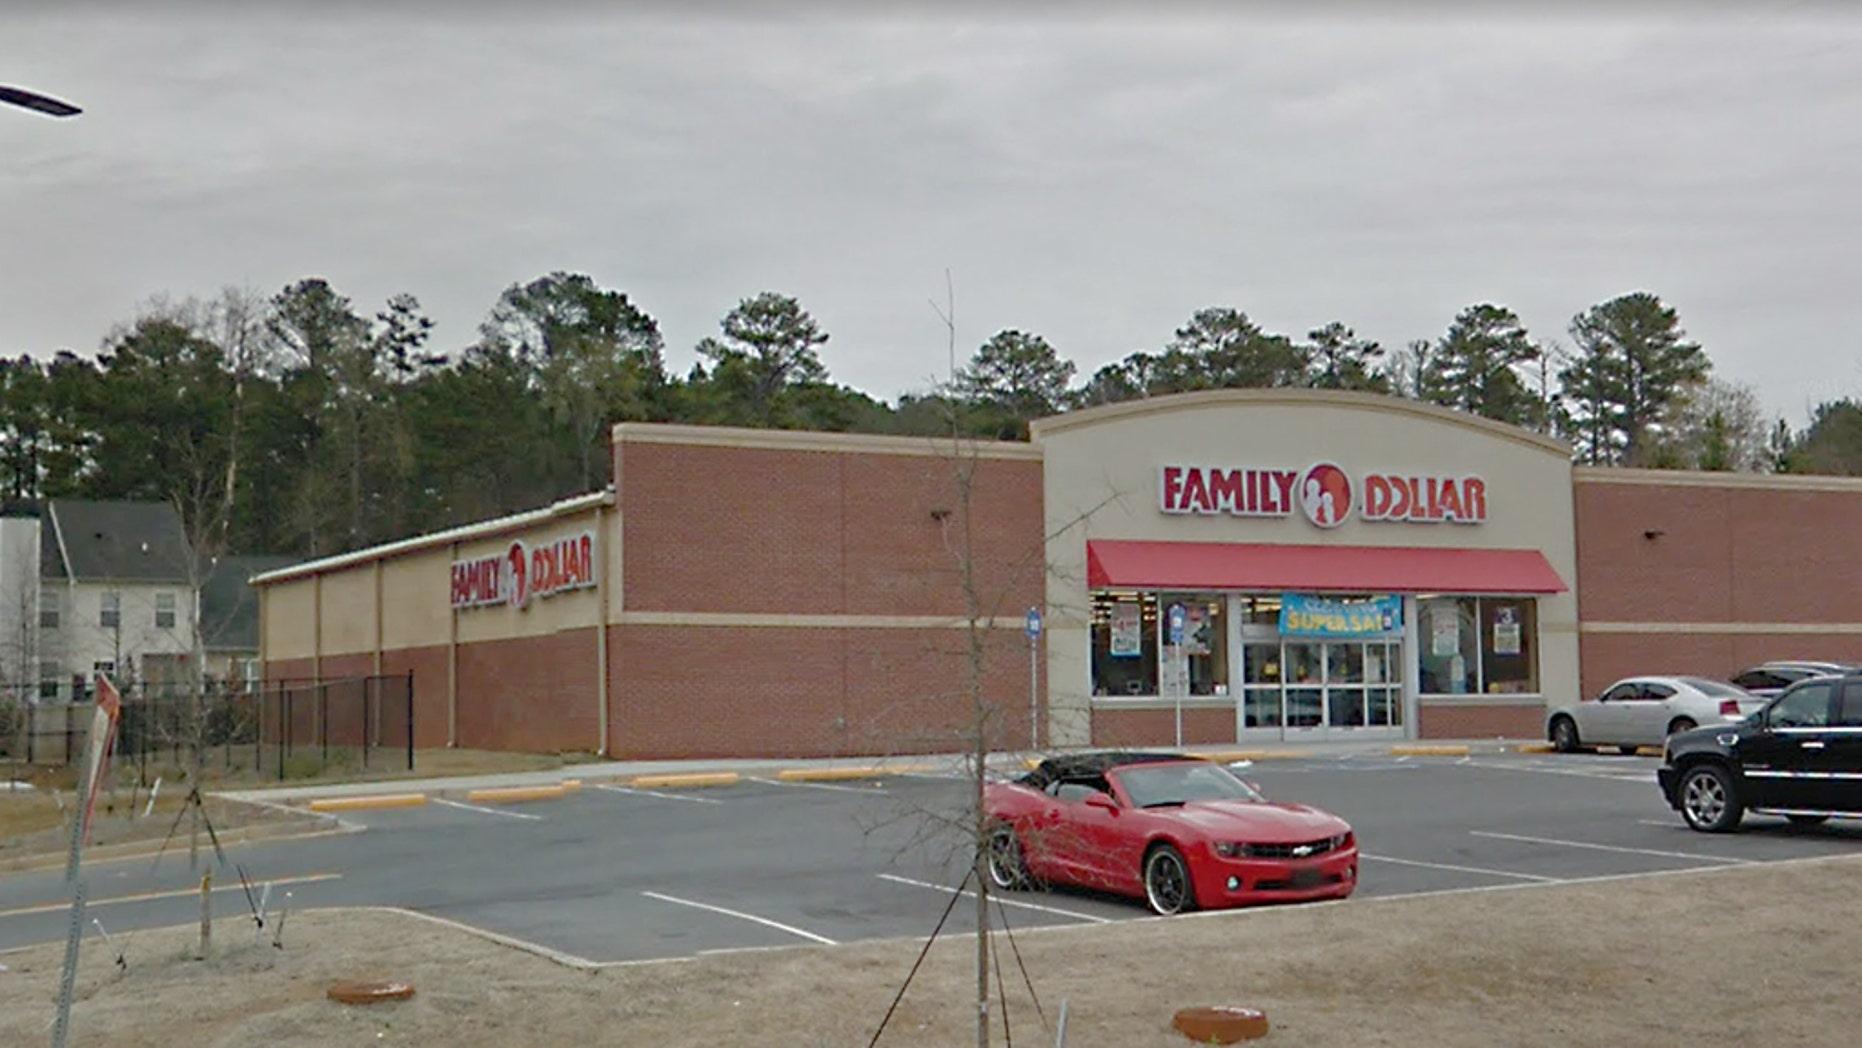 Georgia man shoots, kills armed robber at Family Dollar | Fox News